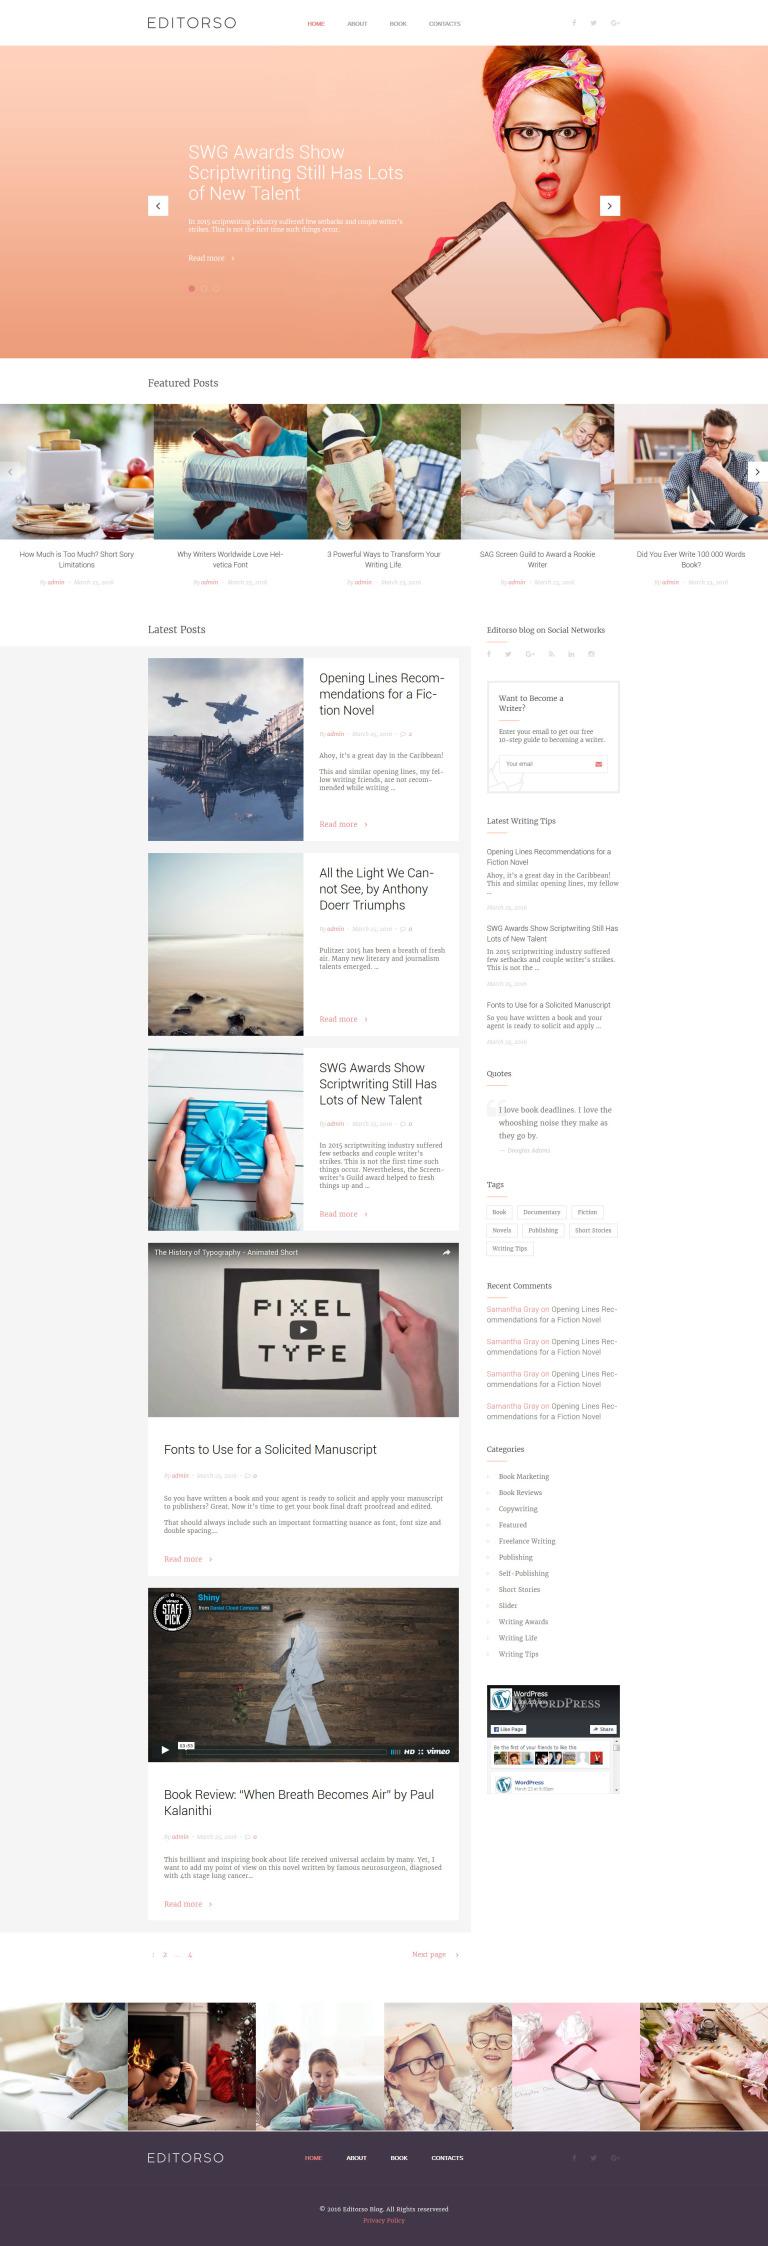 Editorso - Journalist Blog WordPress Theme New Screenshots BIG